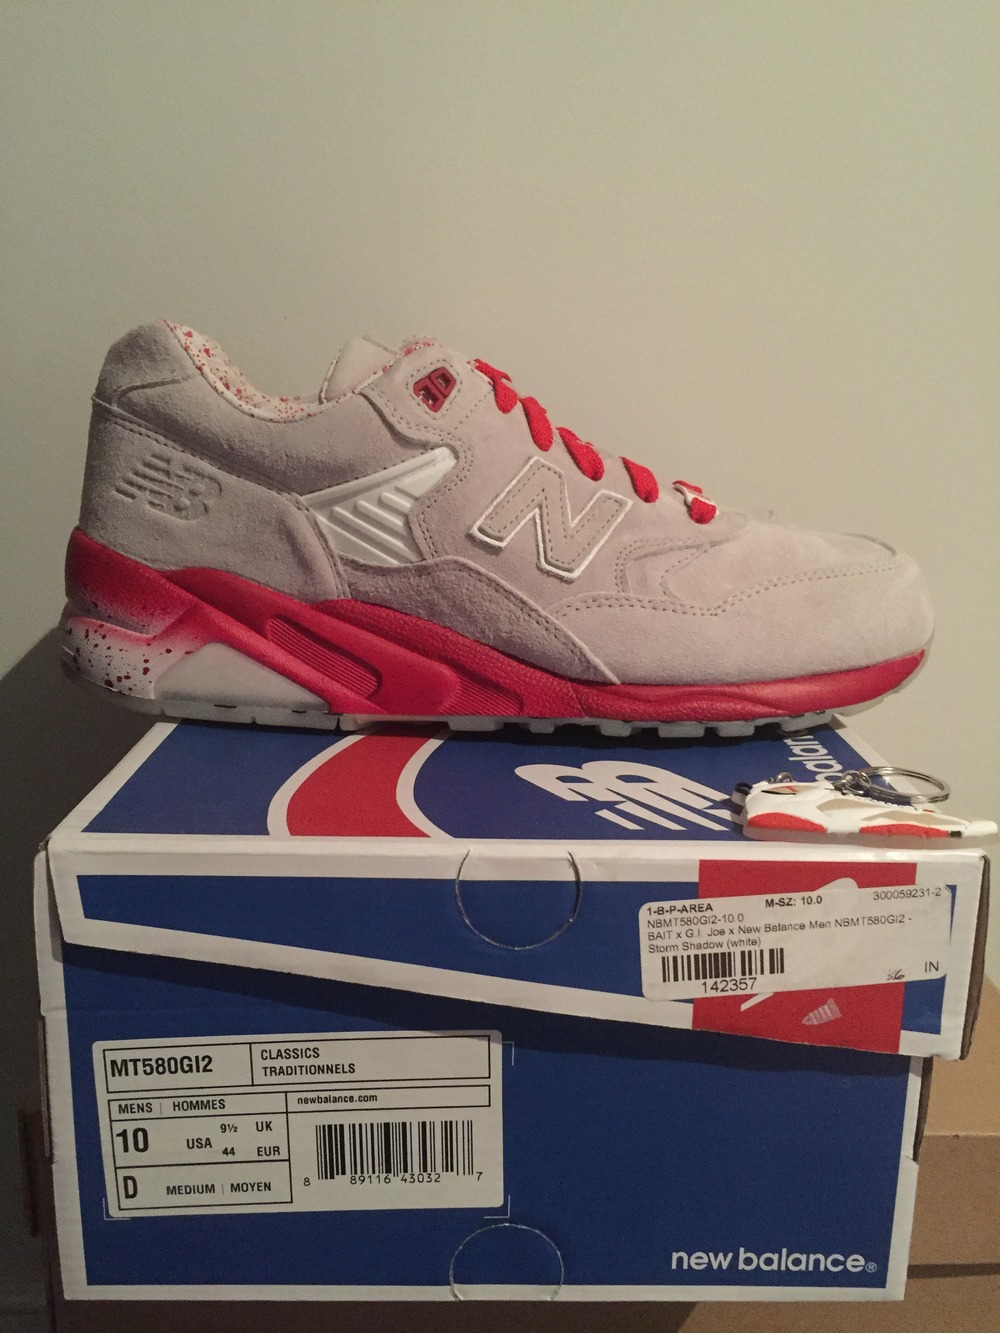 joes discount shoes new balance basketball